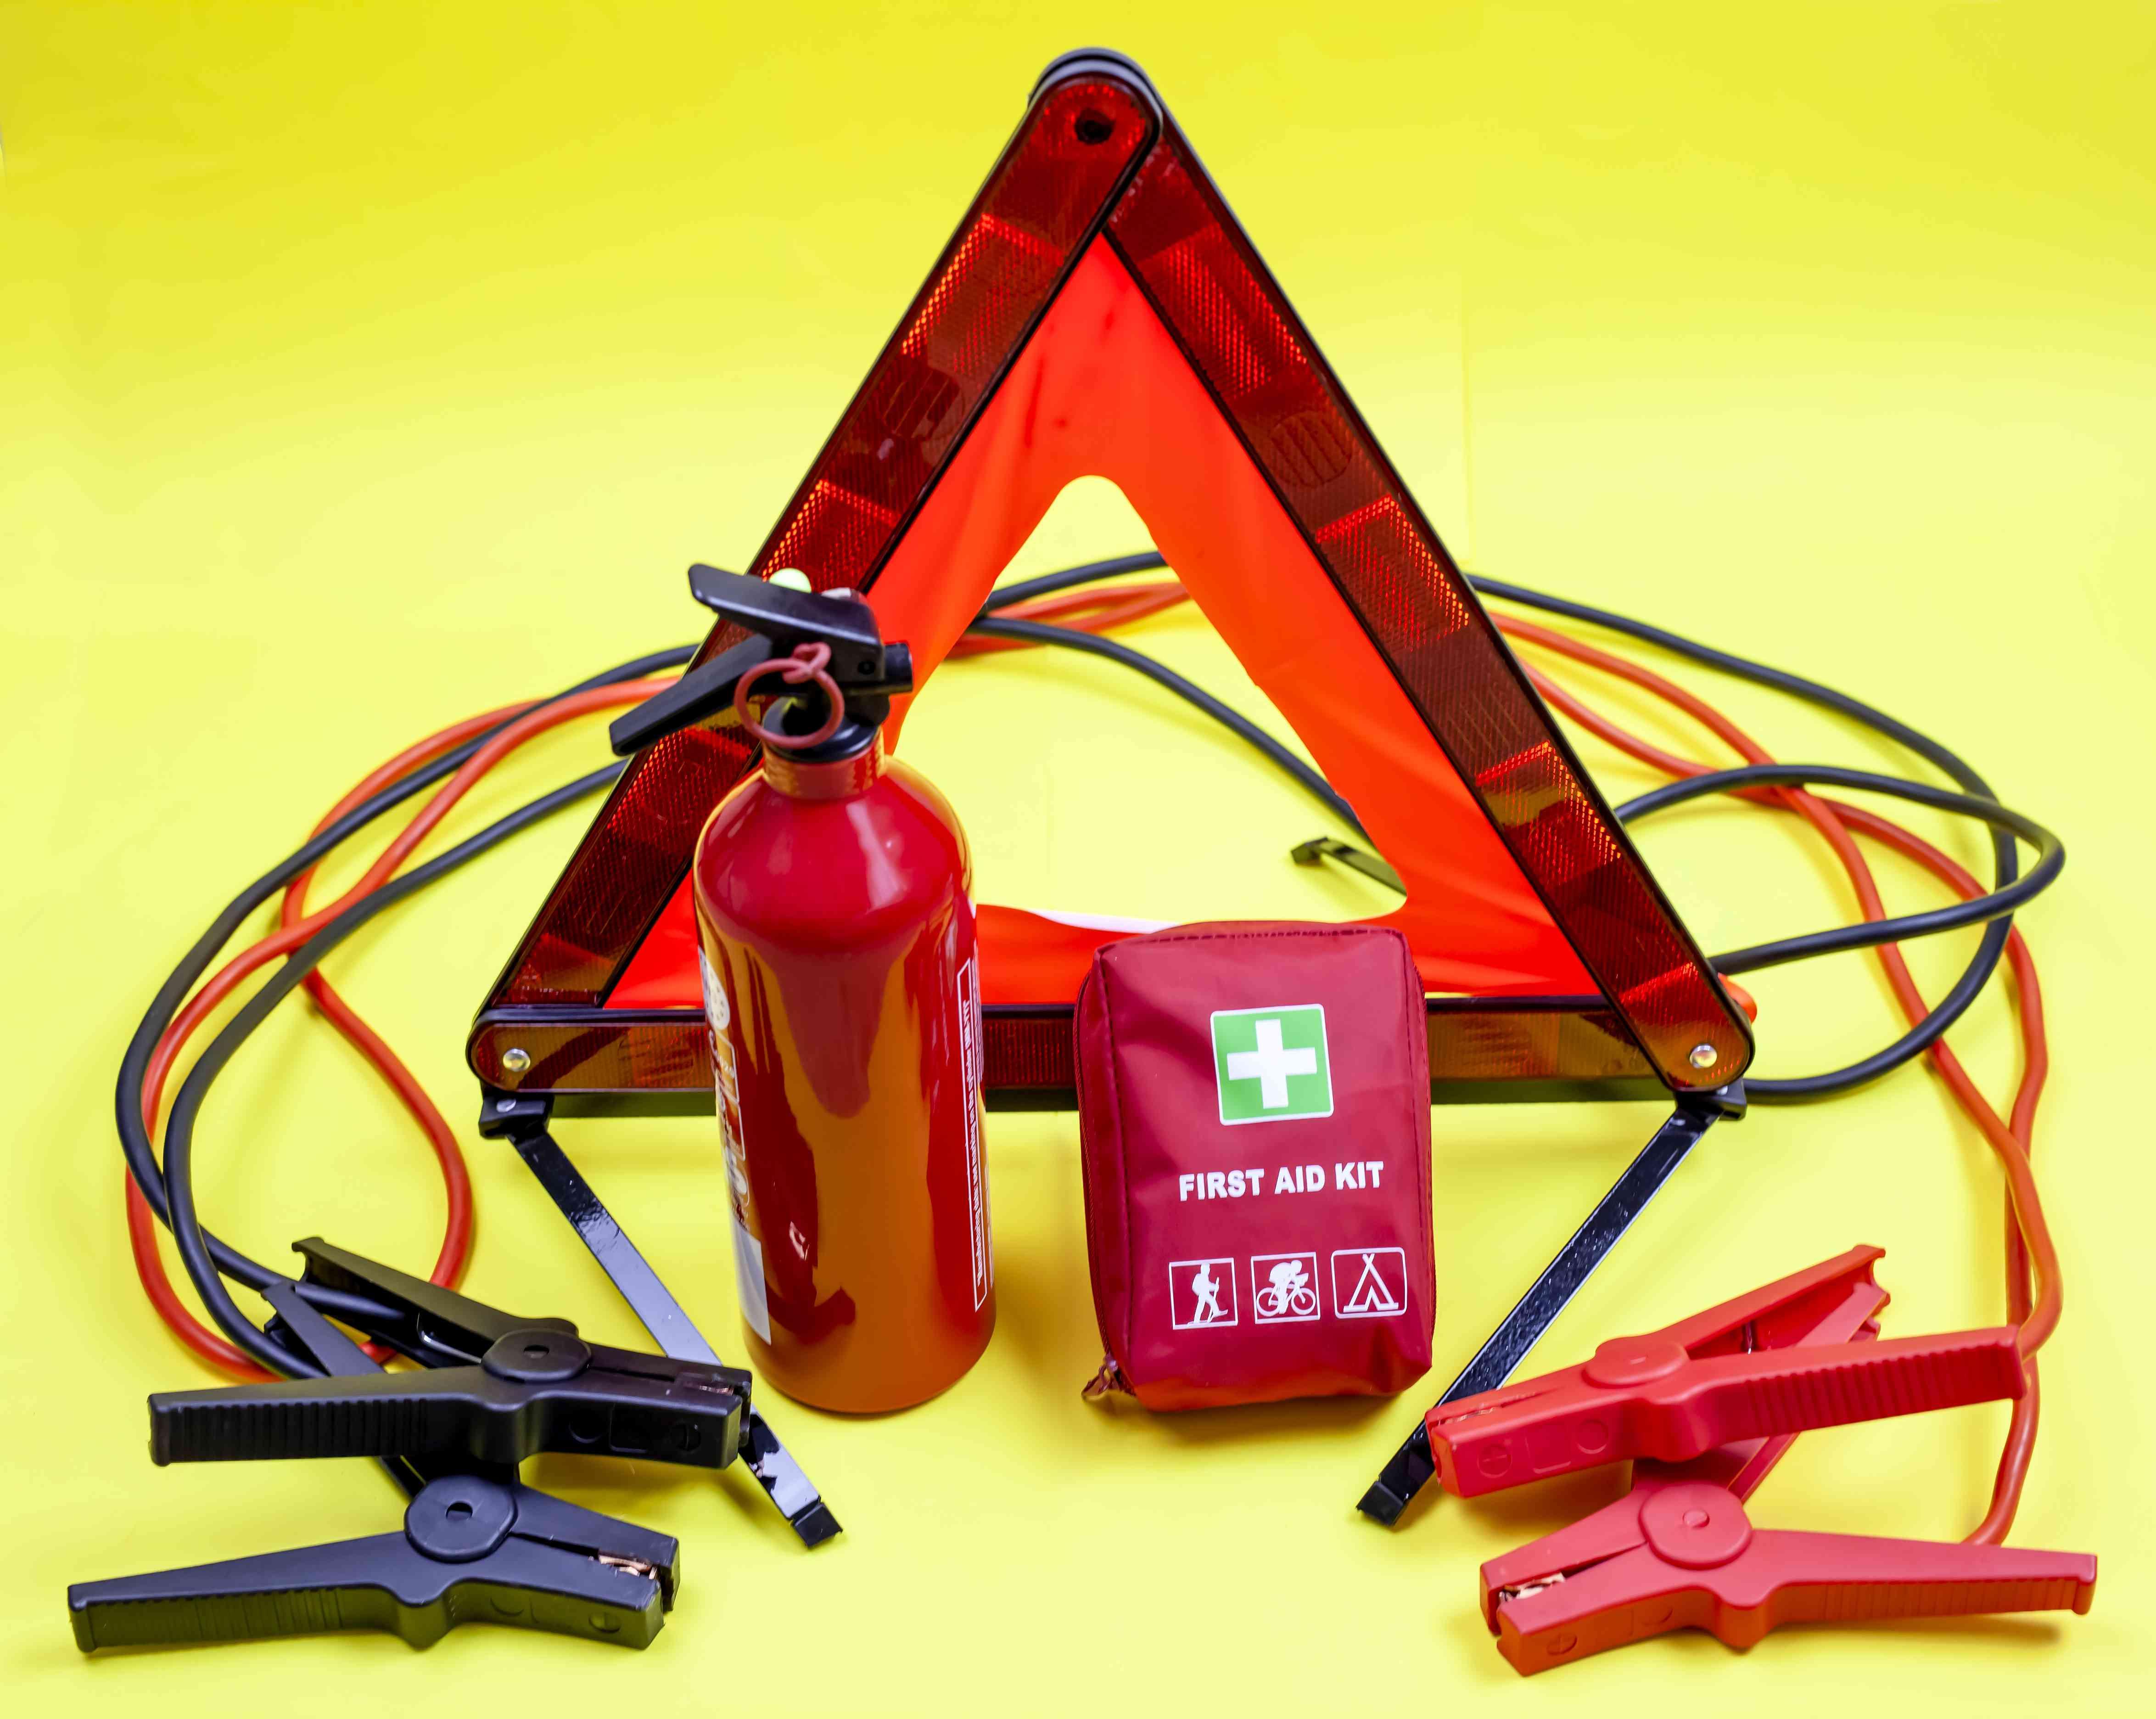 Kit de accidentes y averías para vehículo